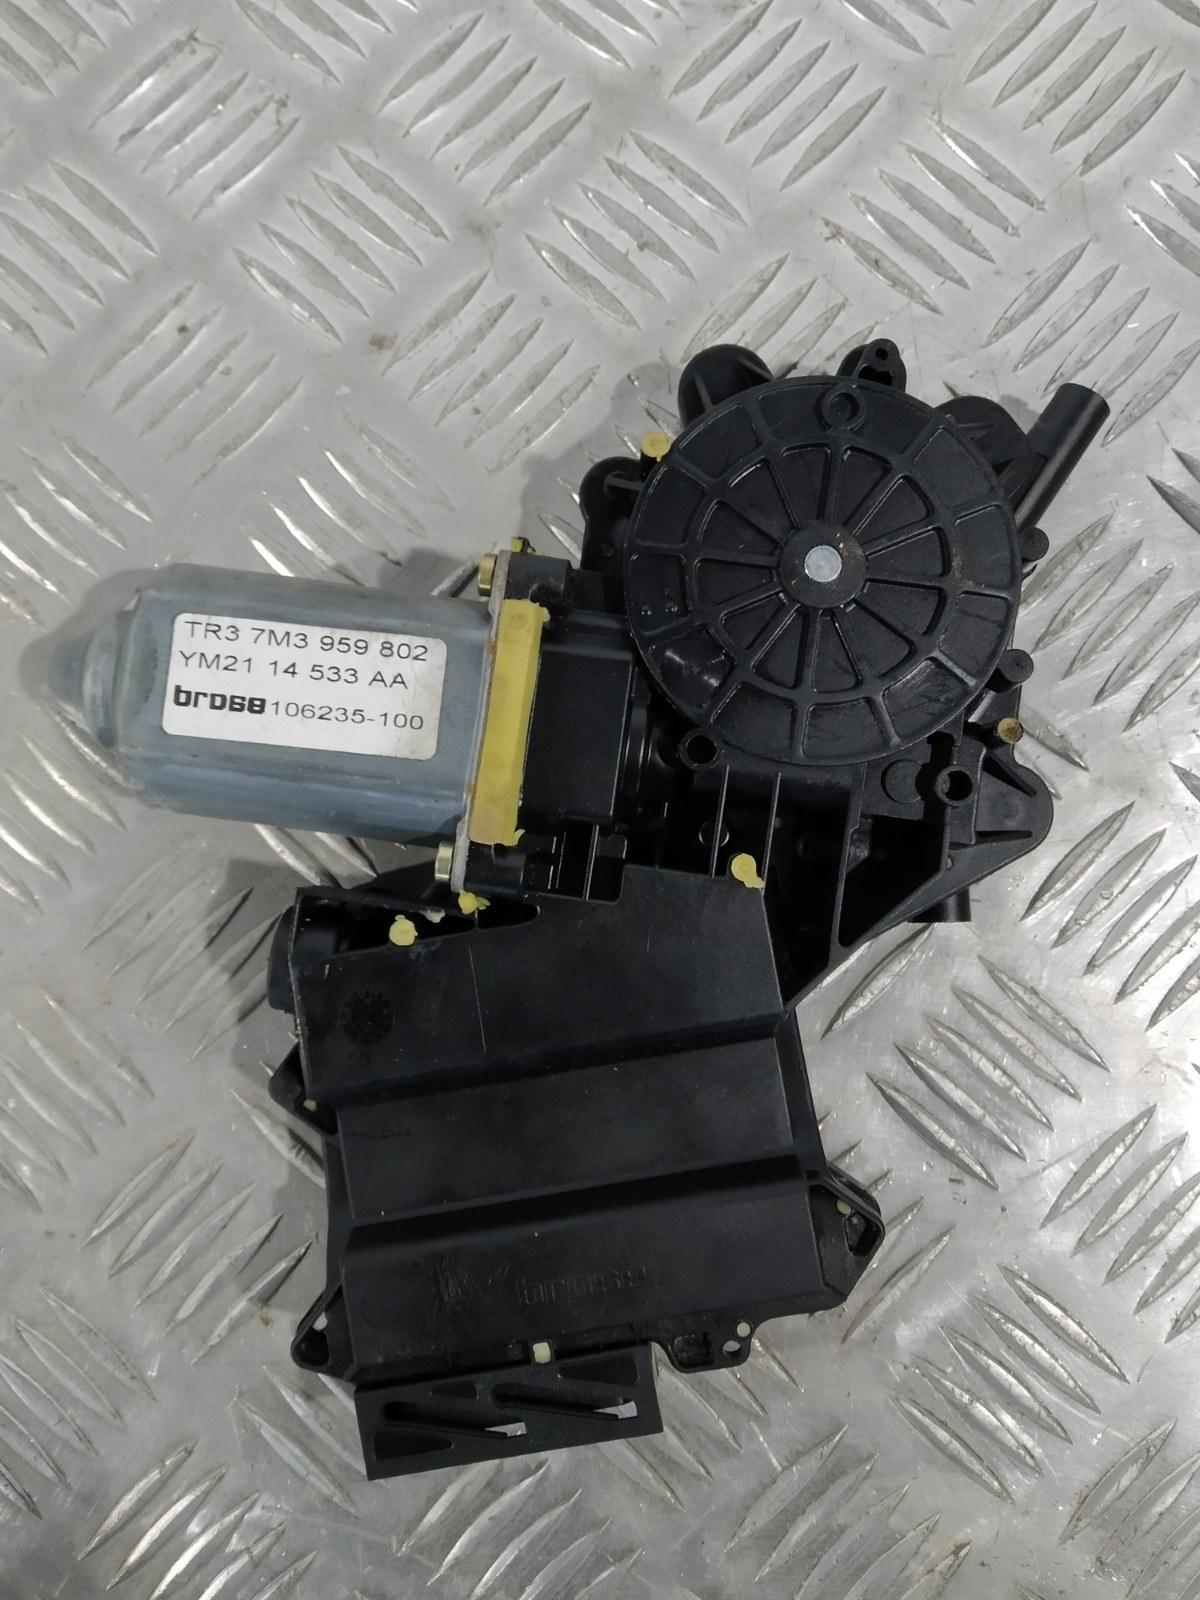 Моторчик стеклоподъемника передний правый Seat Alhambra 1.9 TDI 2002 (б/у)